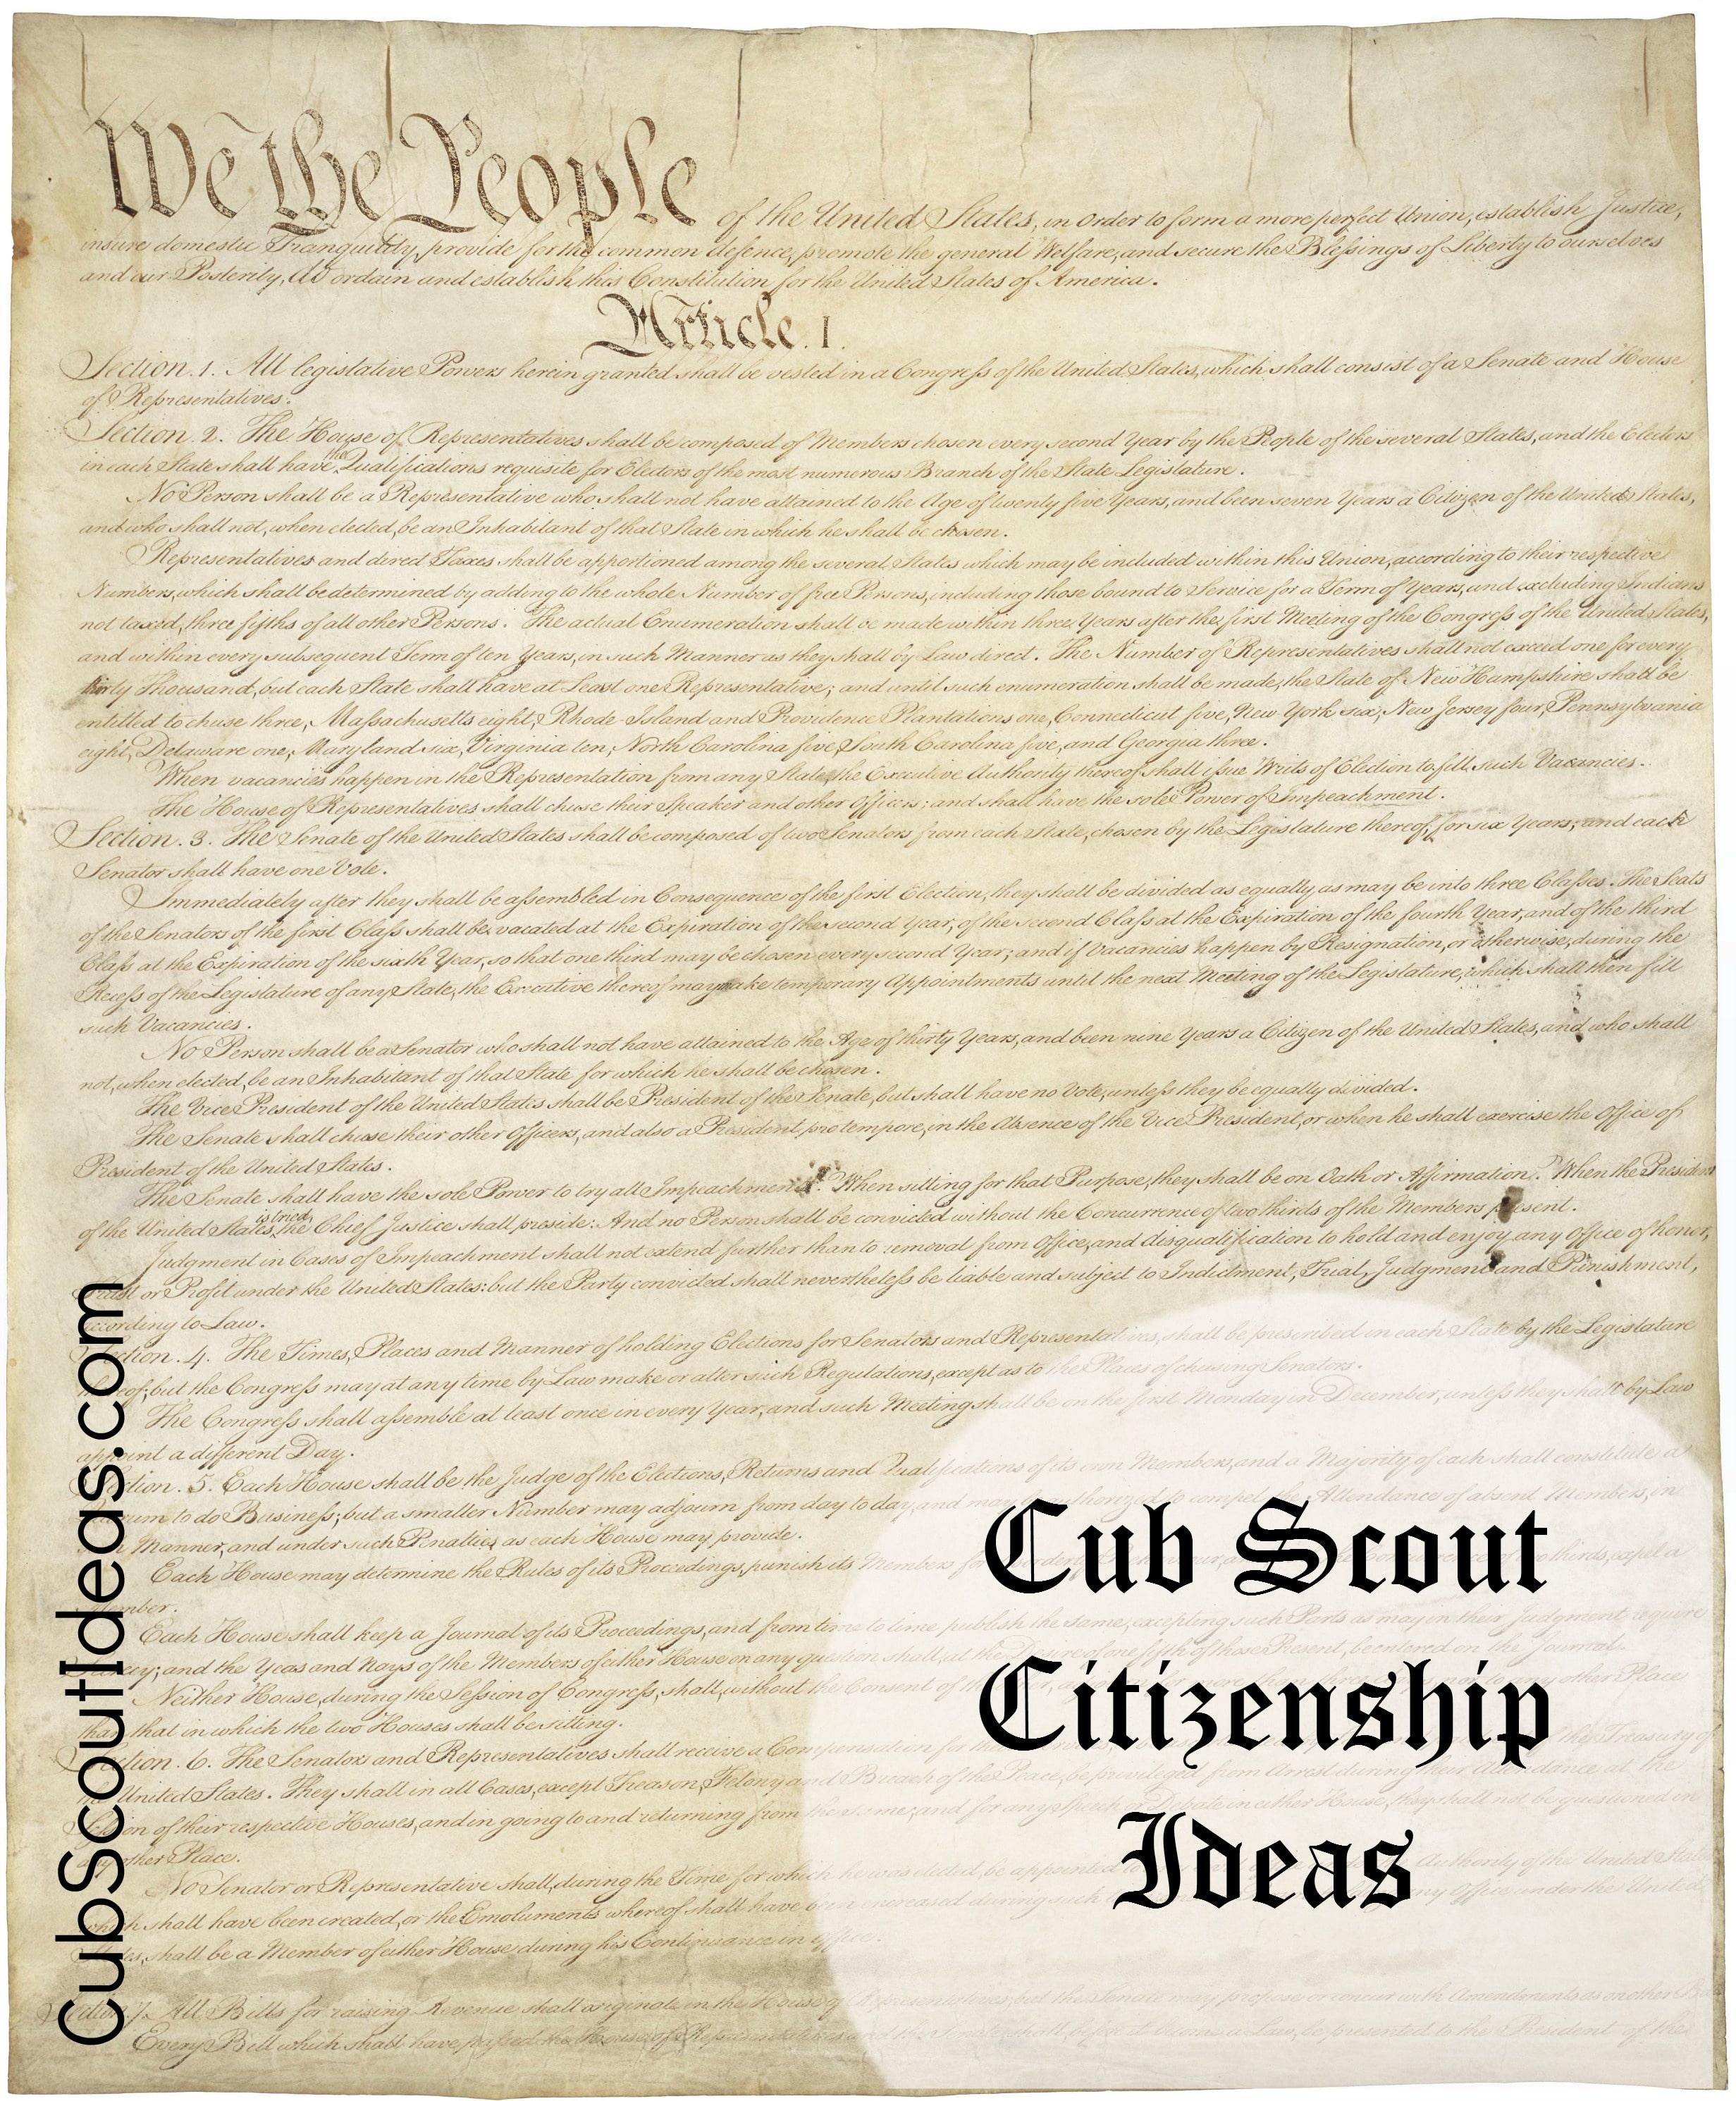 Scout Belt Loop Worksheets Delibertad – Cub Scout Belt Loops Worksheets